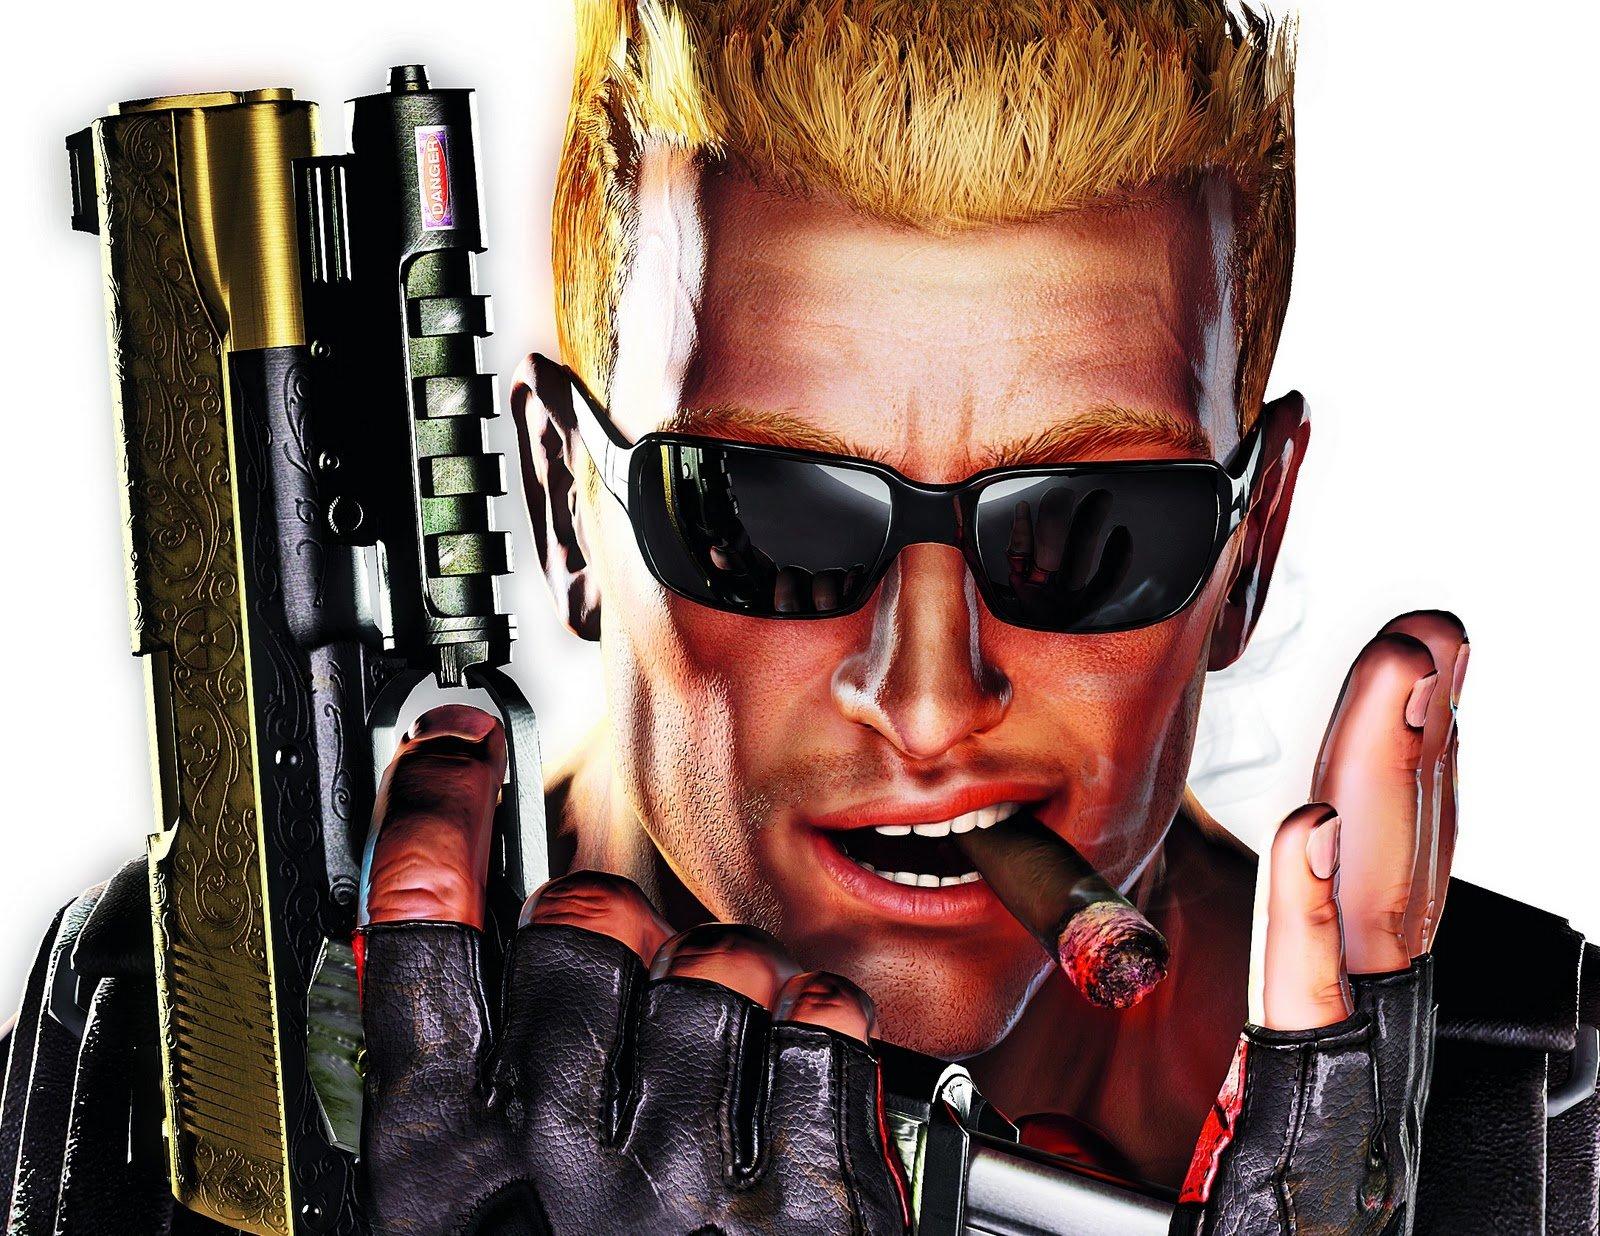 Duke Nukem 3D: 20th Anniversary Edition World Tour Announced 2